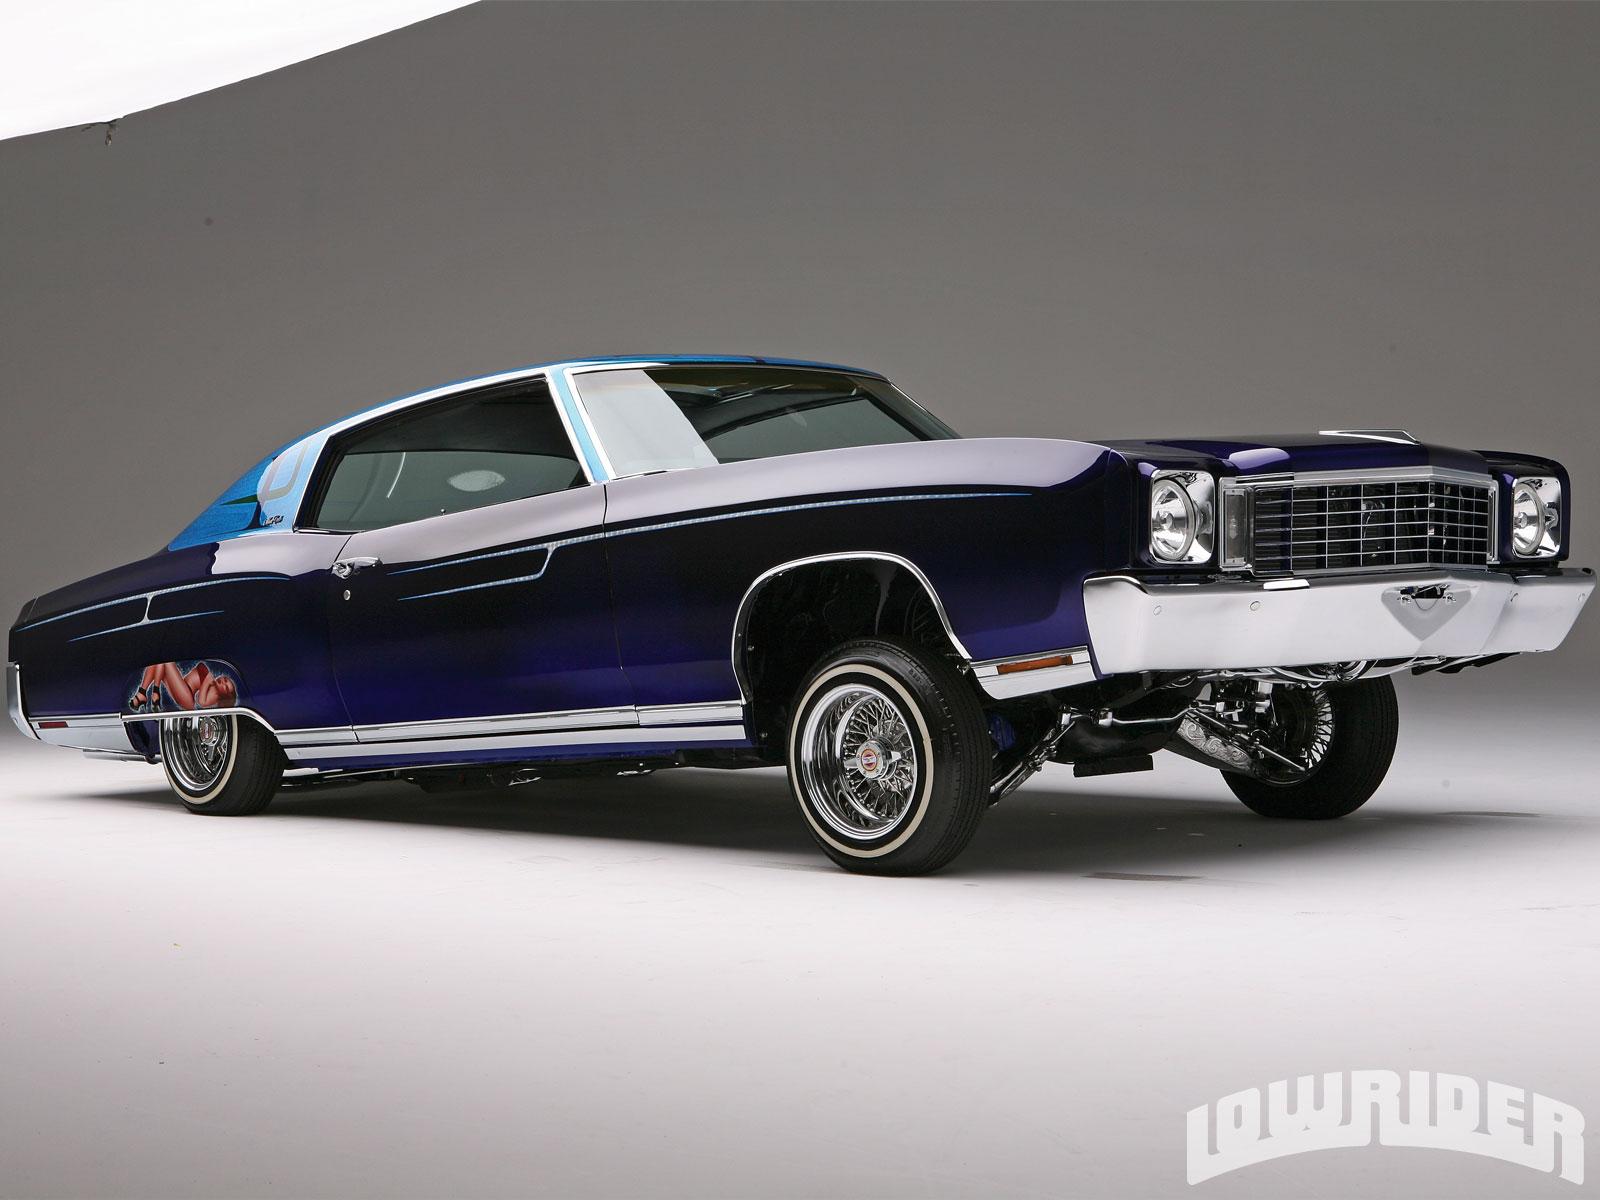 1972 Chevrolet Monte Carlo - Lowrider Magazine